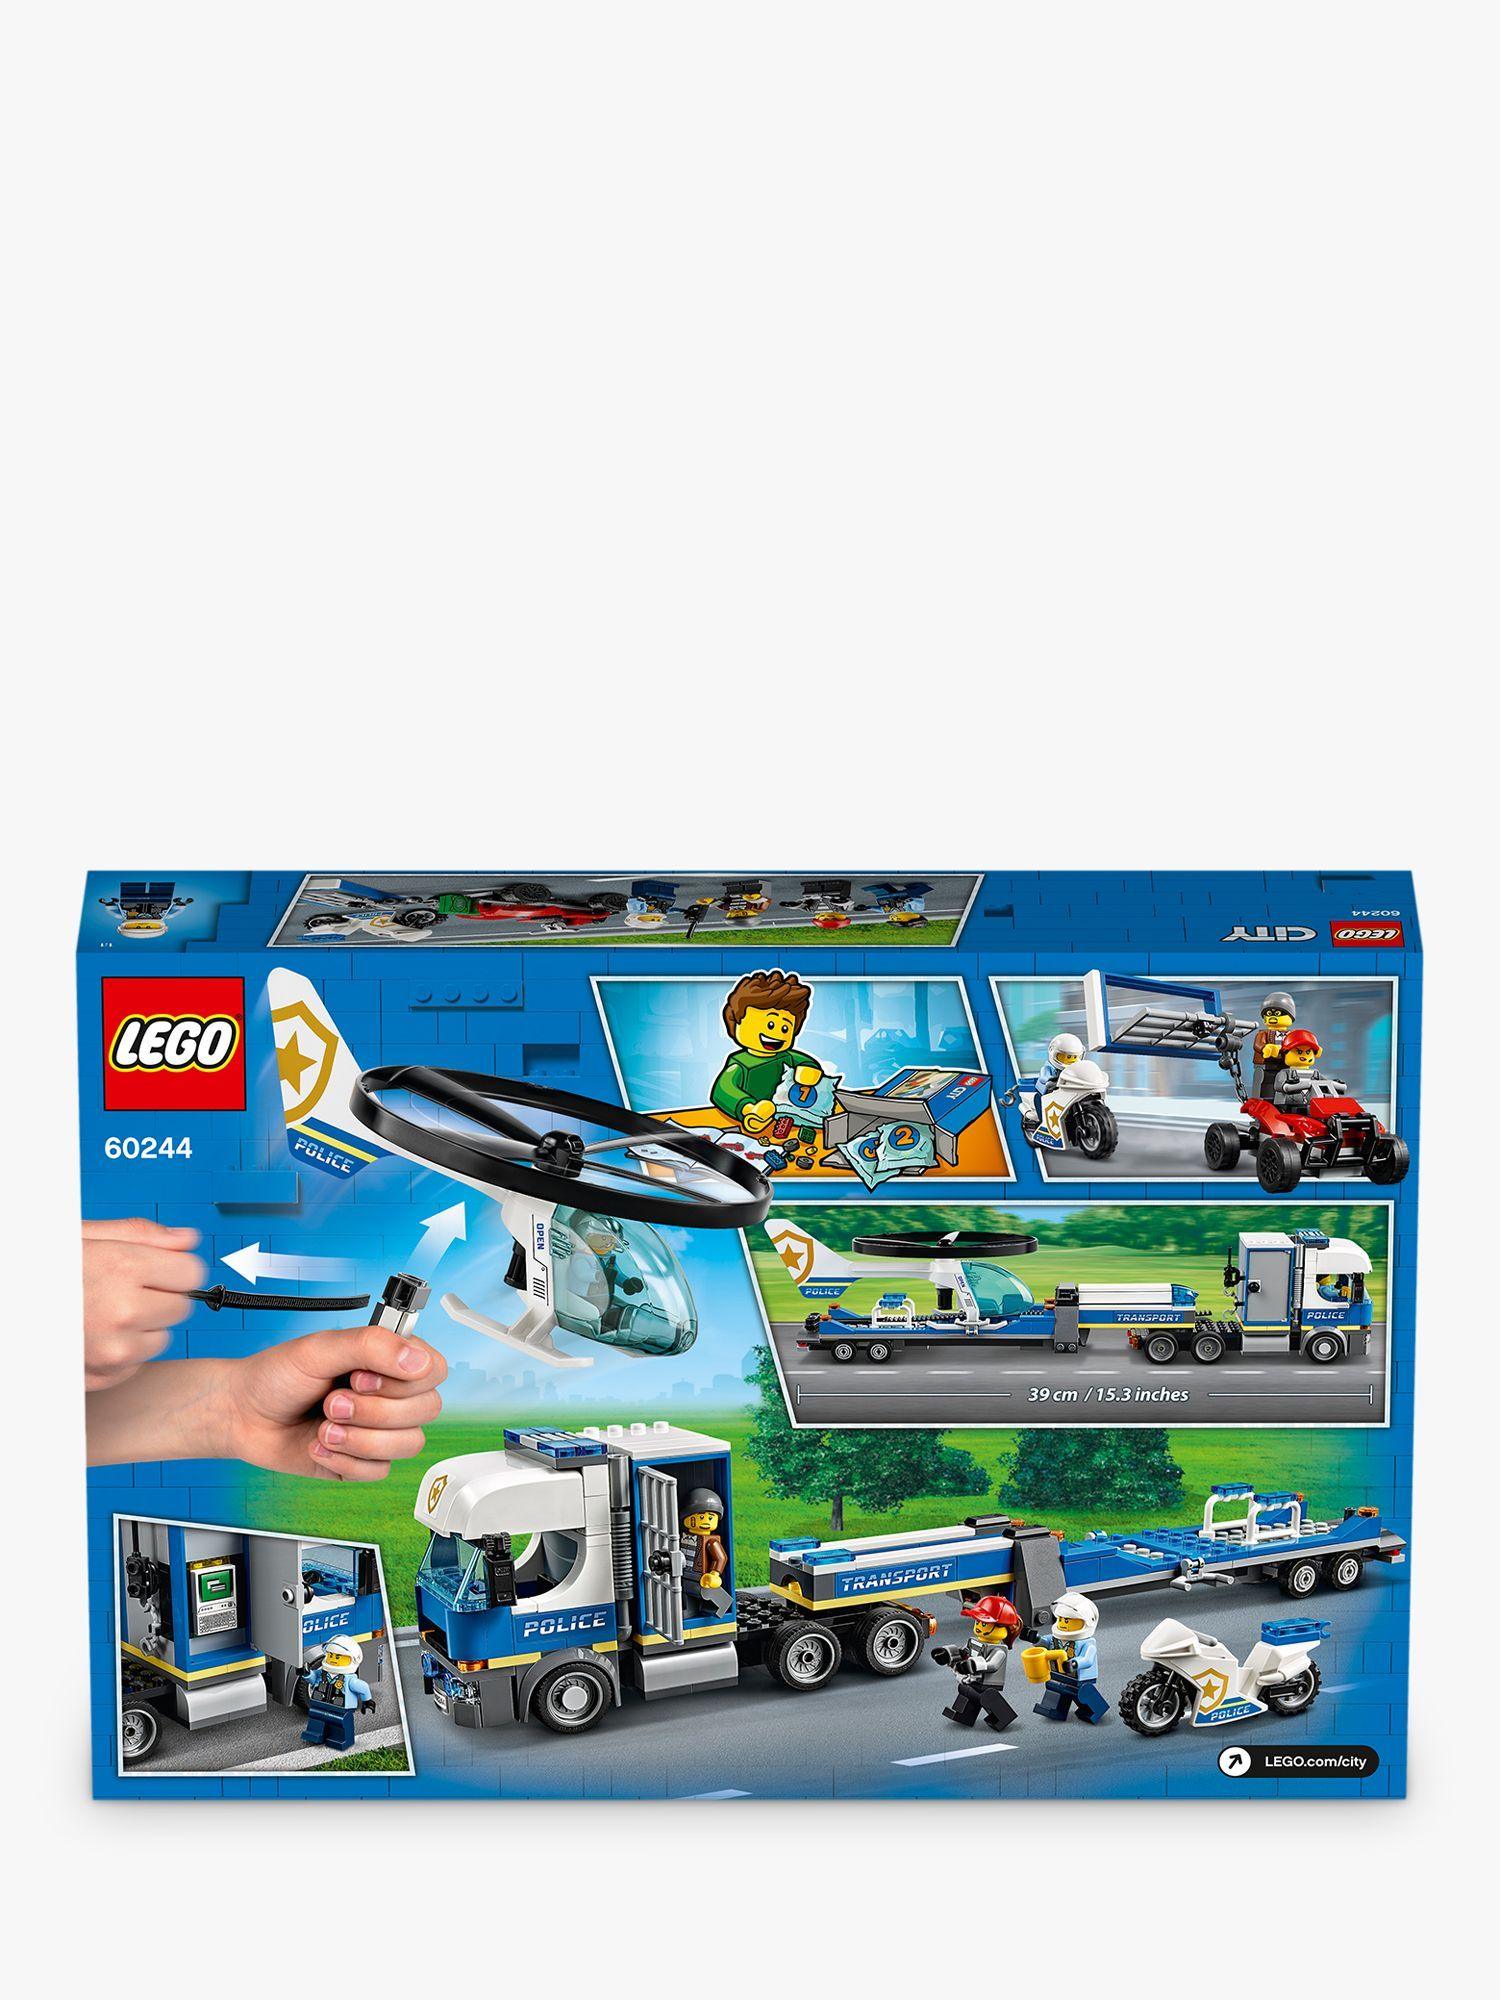 Lego City 60244 Police Helicopter Transport Lego City All Lego Transportation